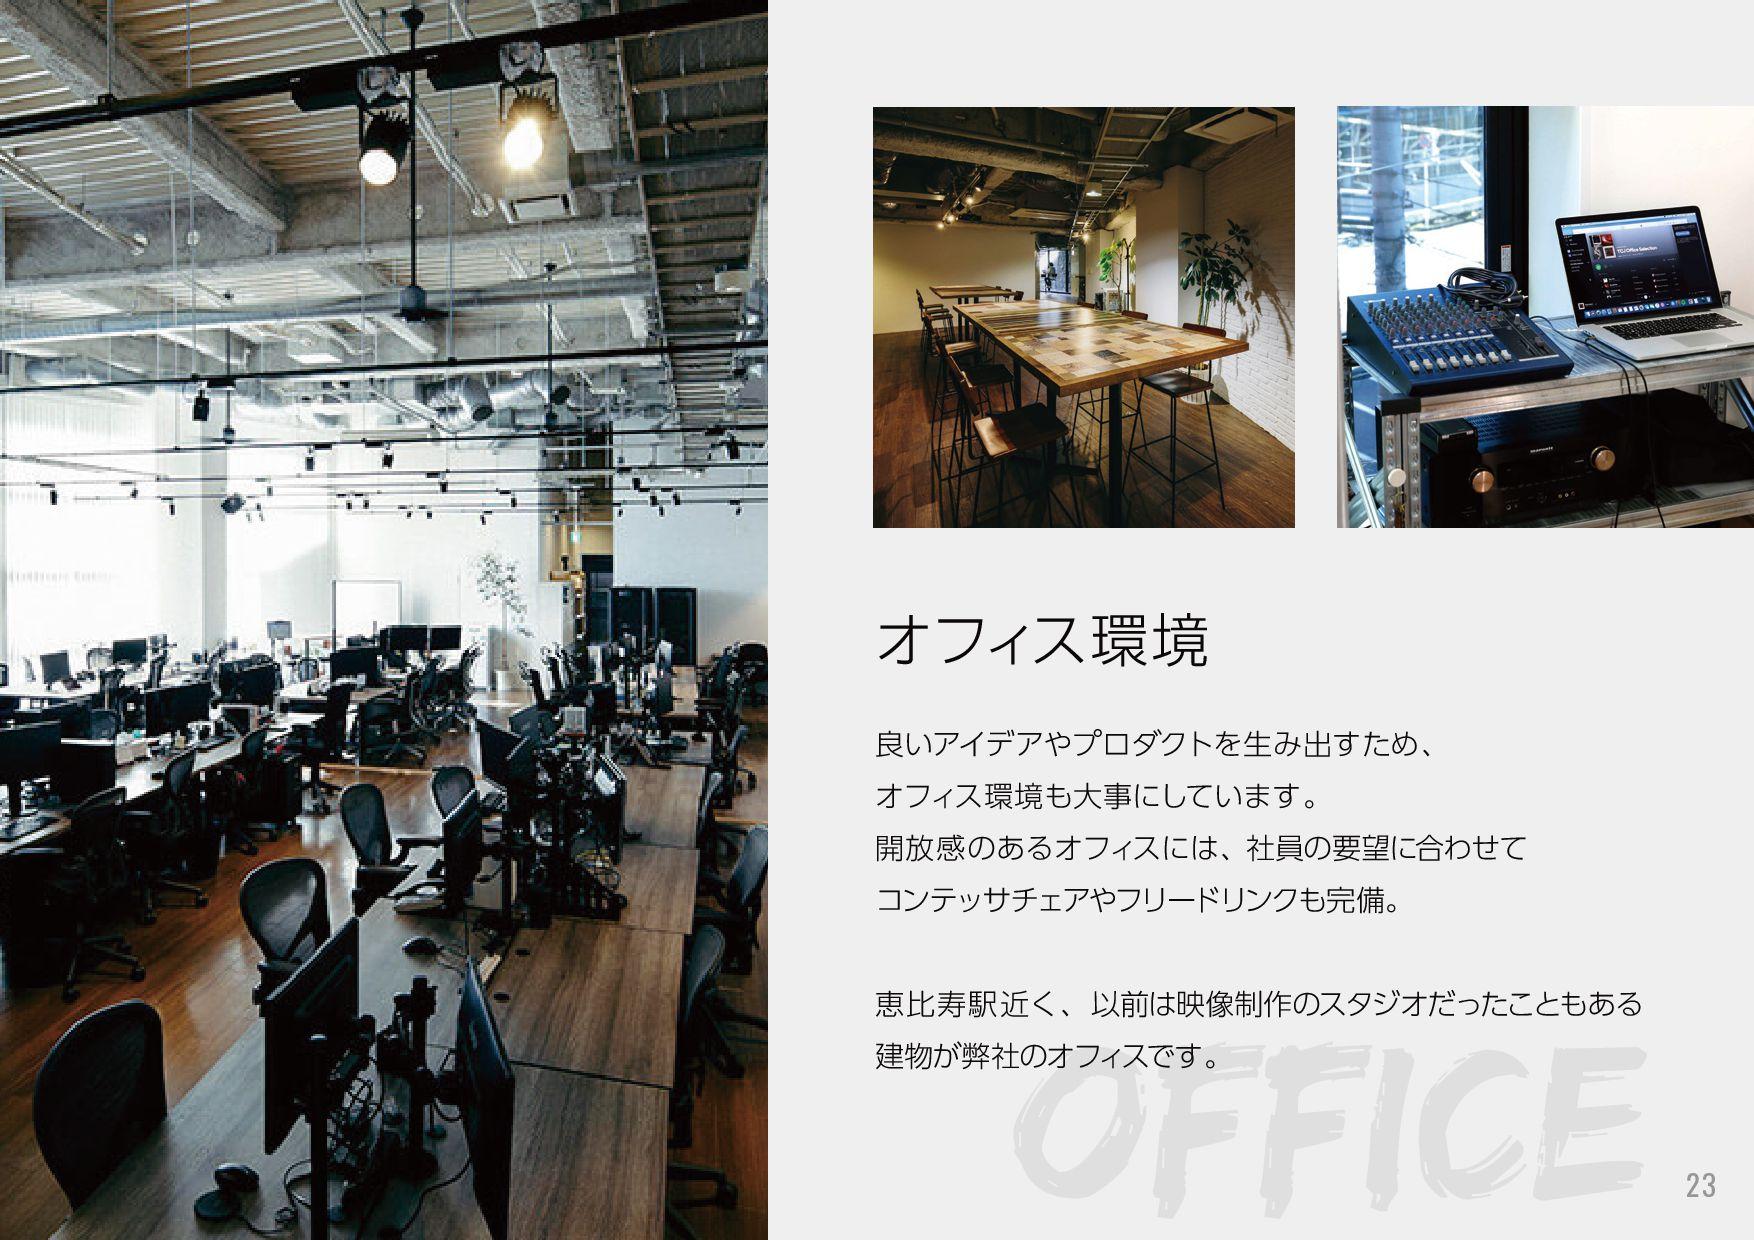 8BOP Ͱɺ Ұॹʹಇؒ͘Λืू͍ͯ͠·͢ɻ ࠾༻αΠτ https://group.w...